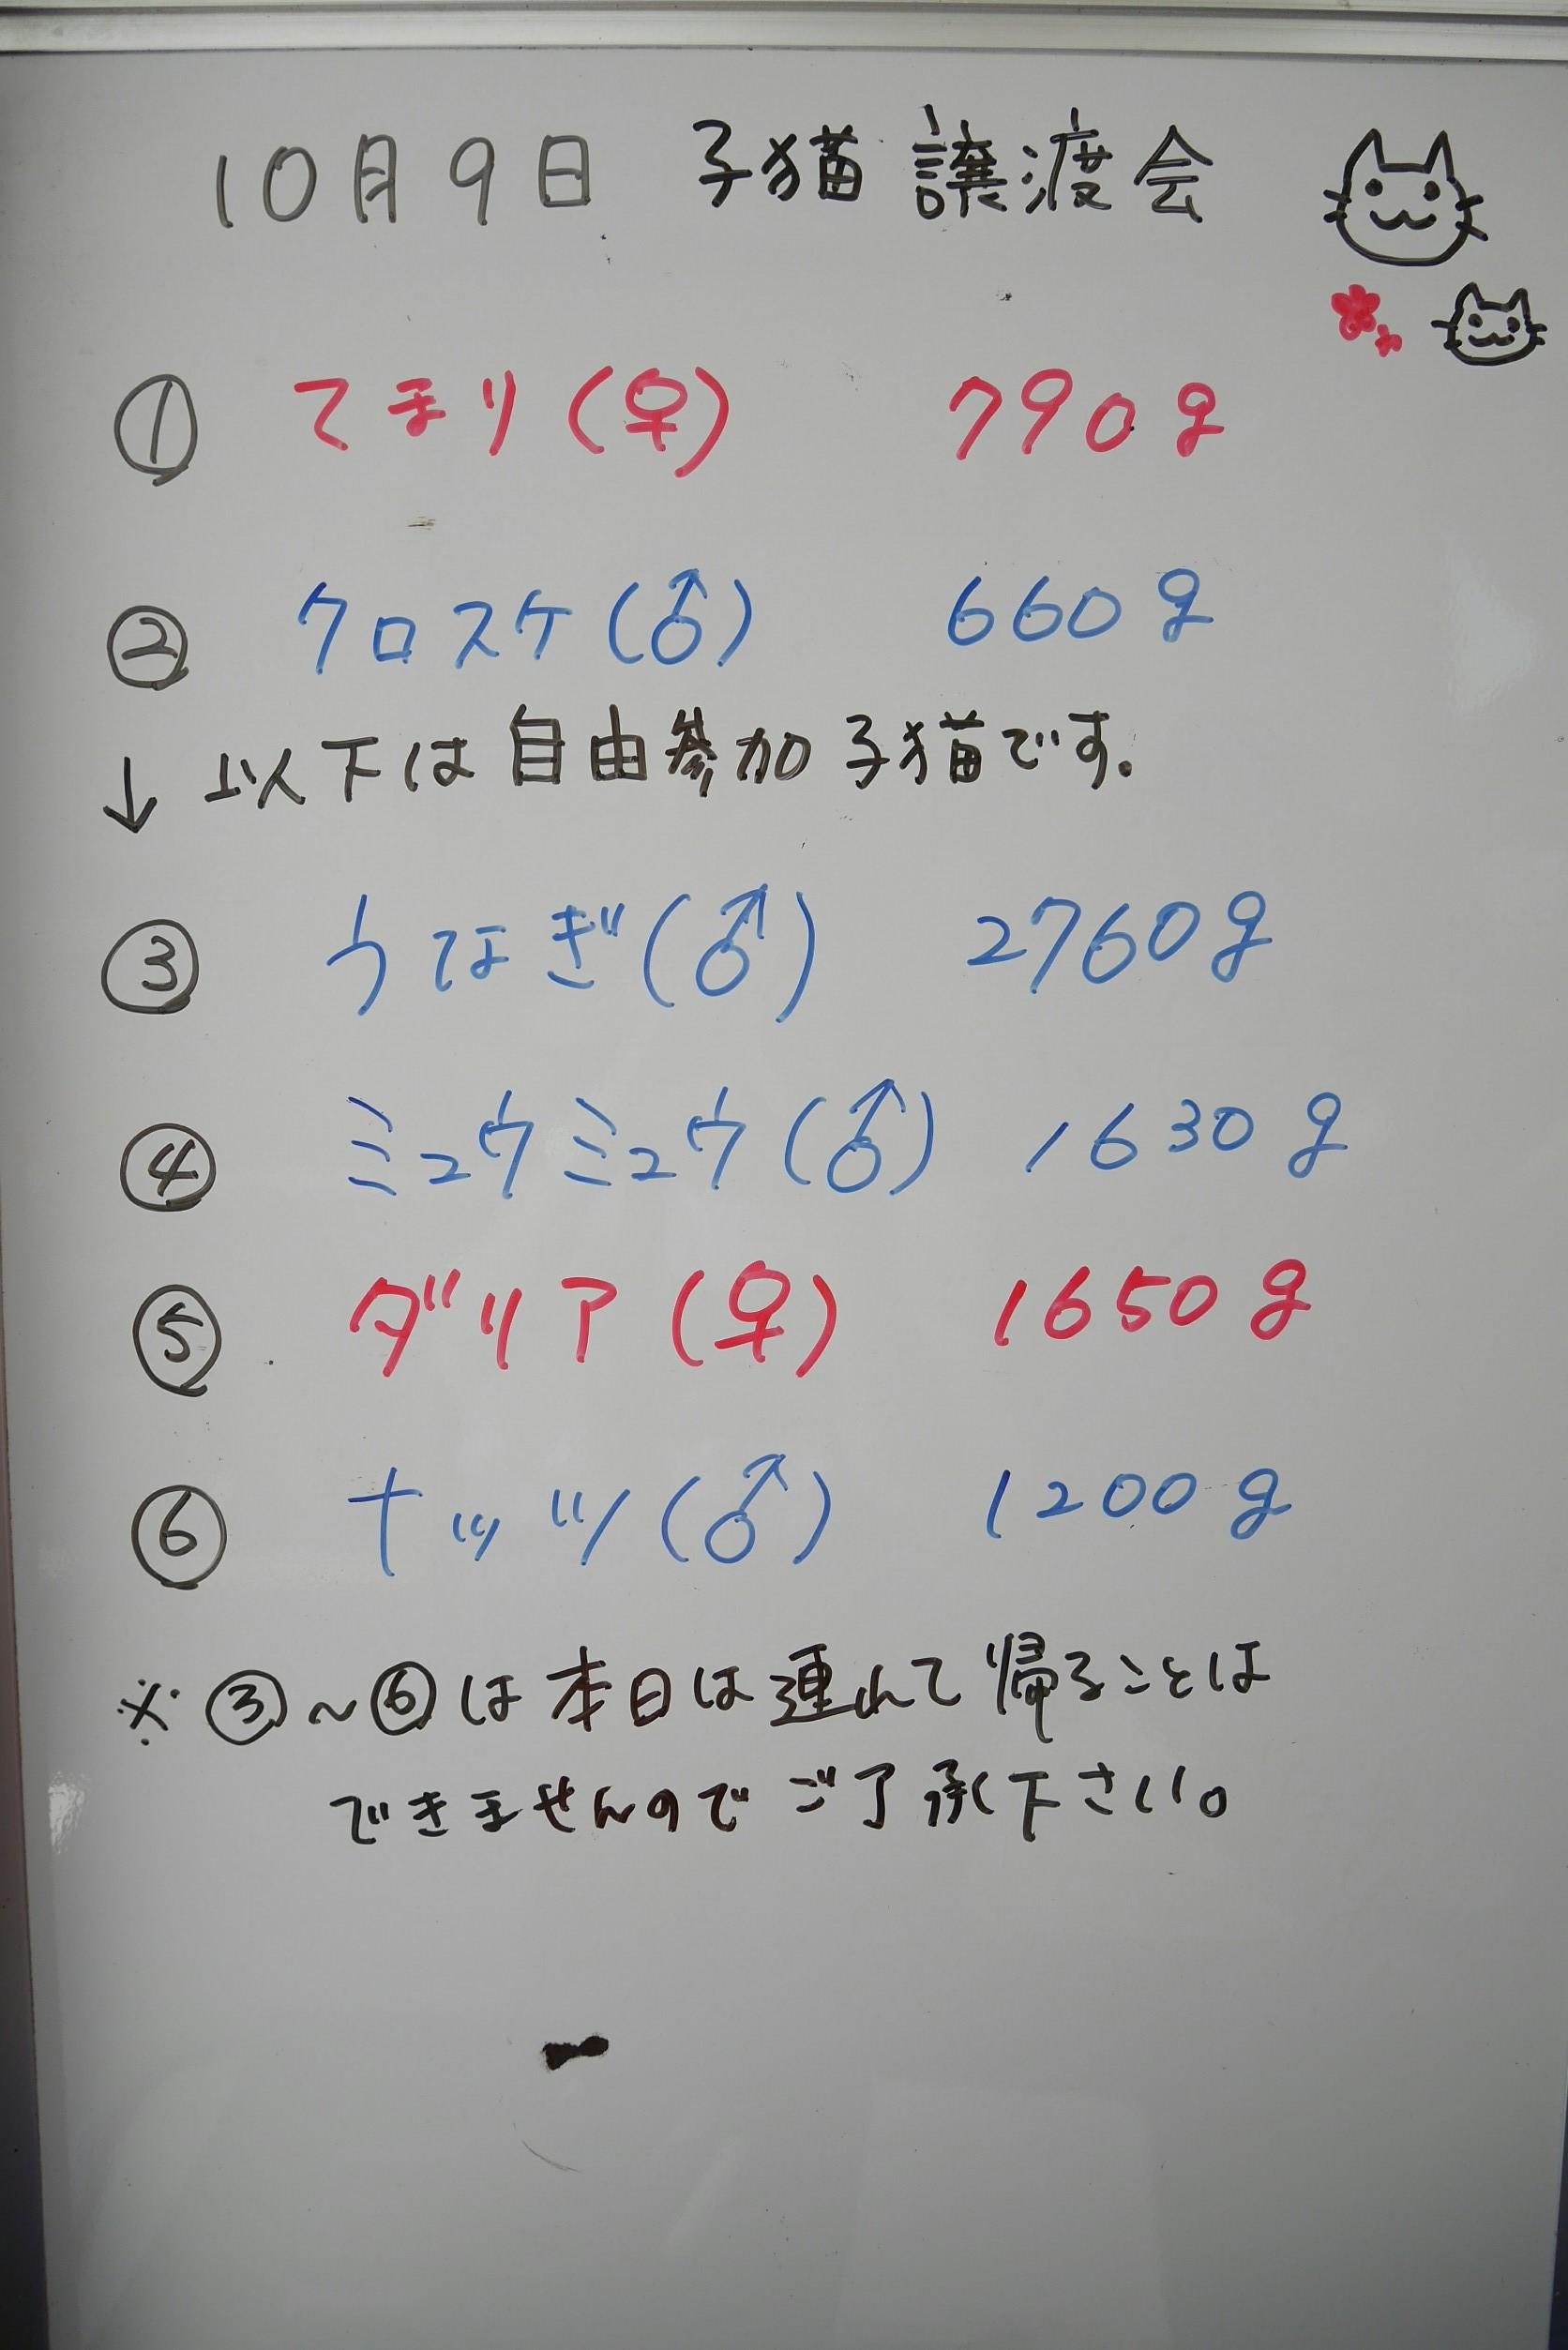 2018101101215374c.jpg